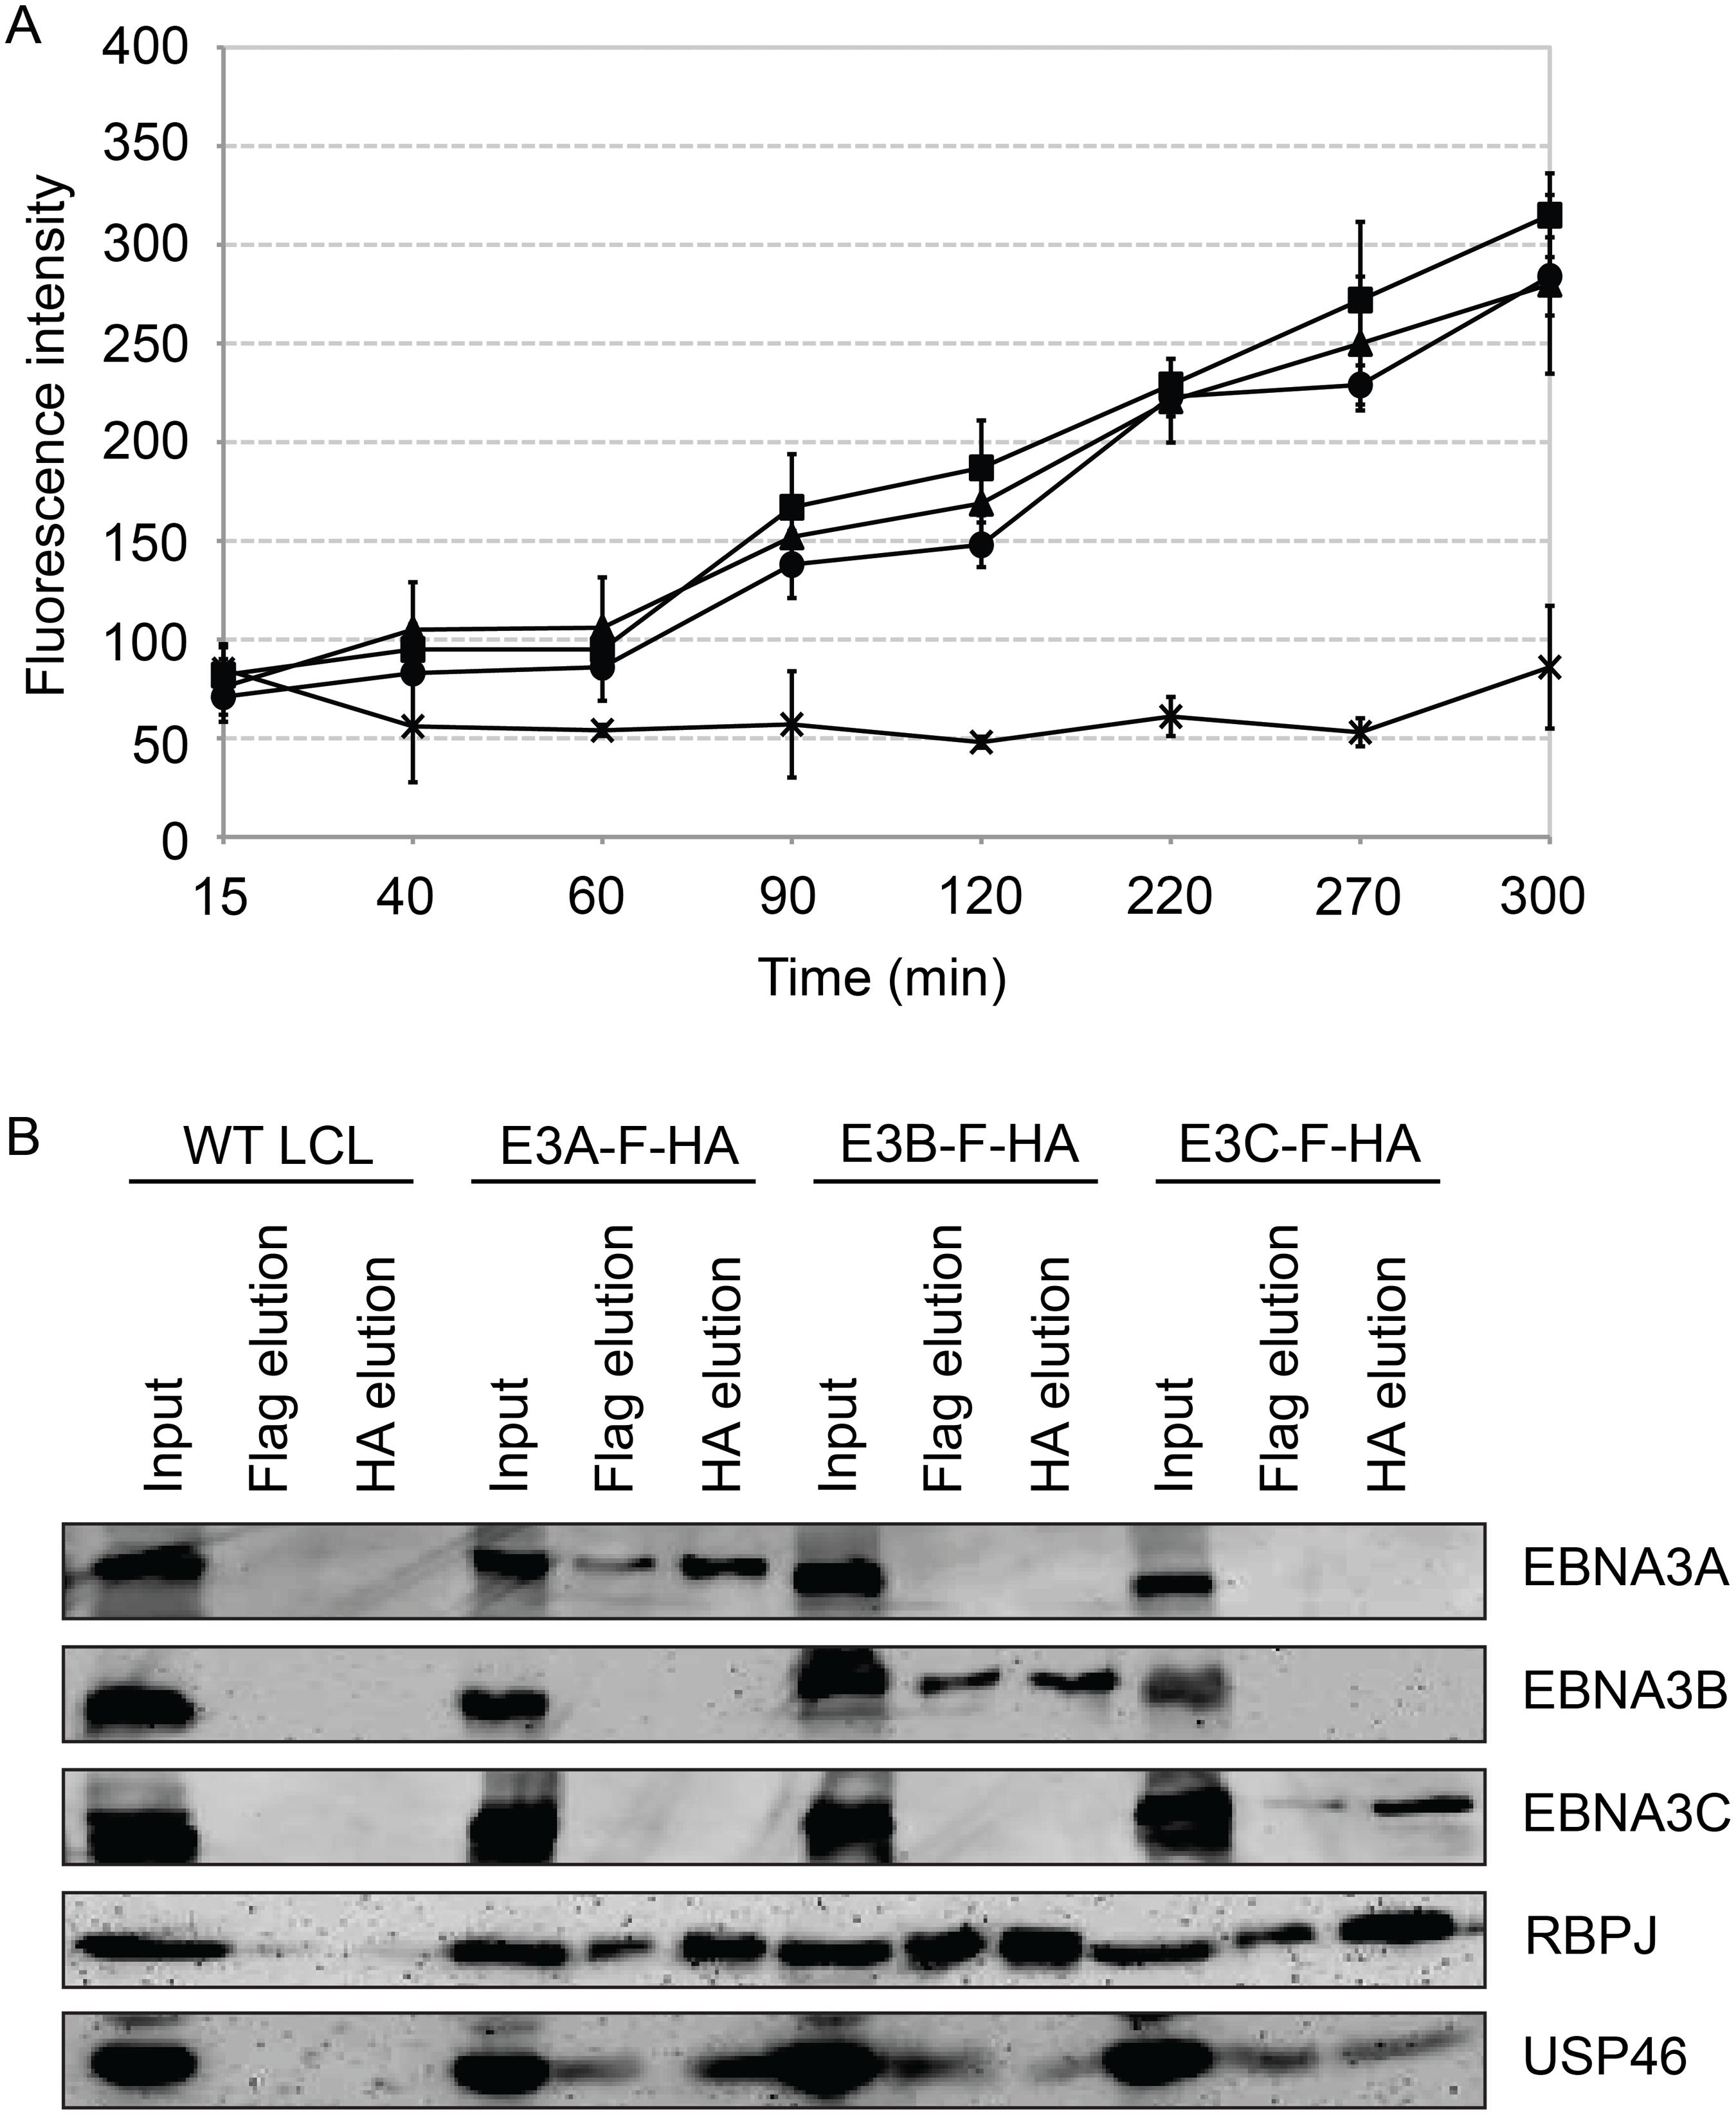 Purified EBNA3 complexes exhibit DUB activity.